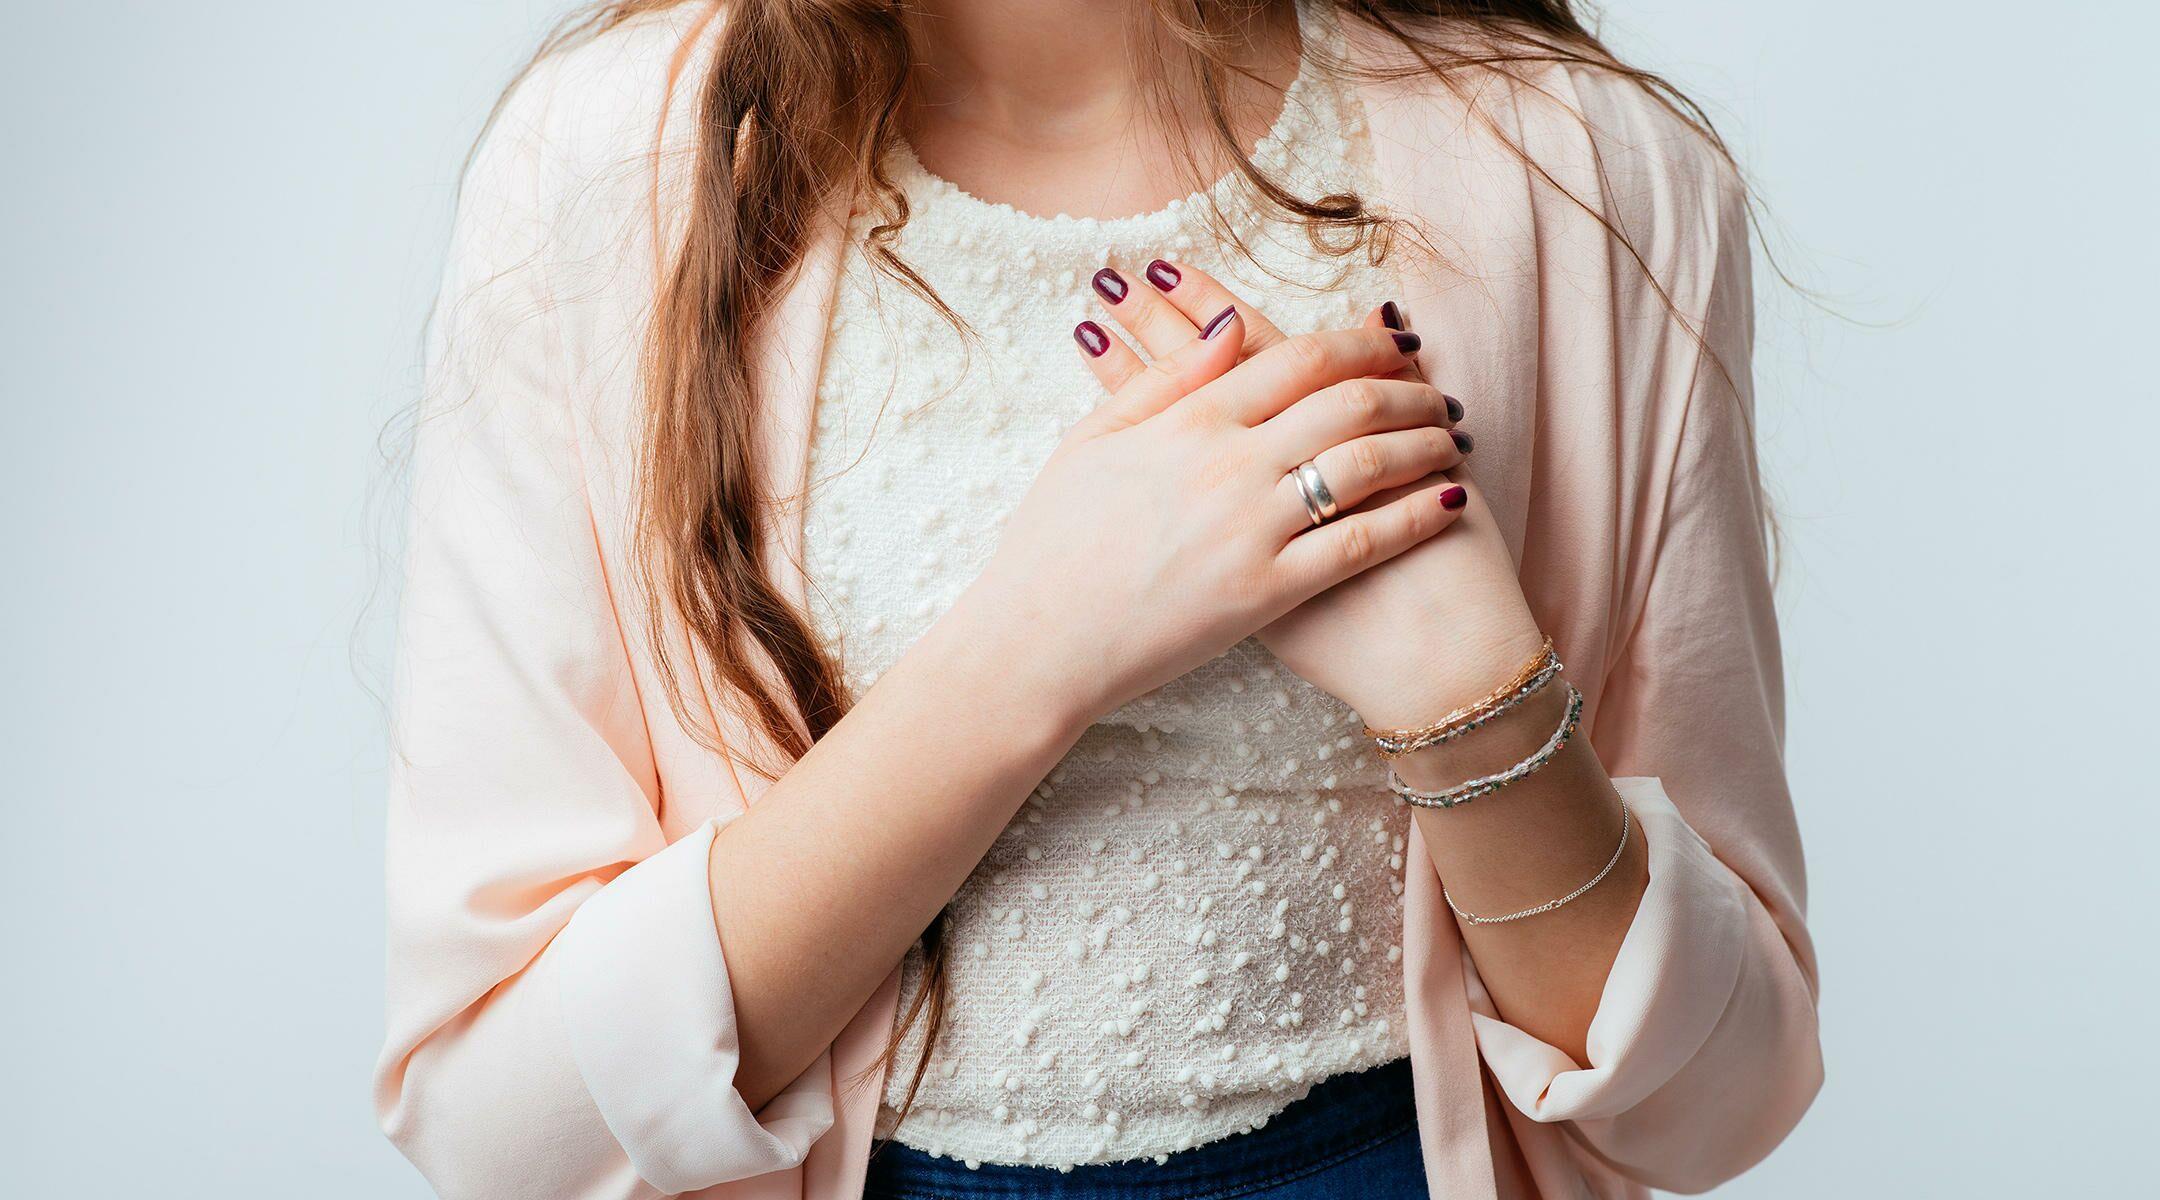 Q&A: Can I Take Heartburn Medication?